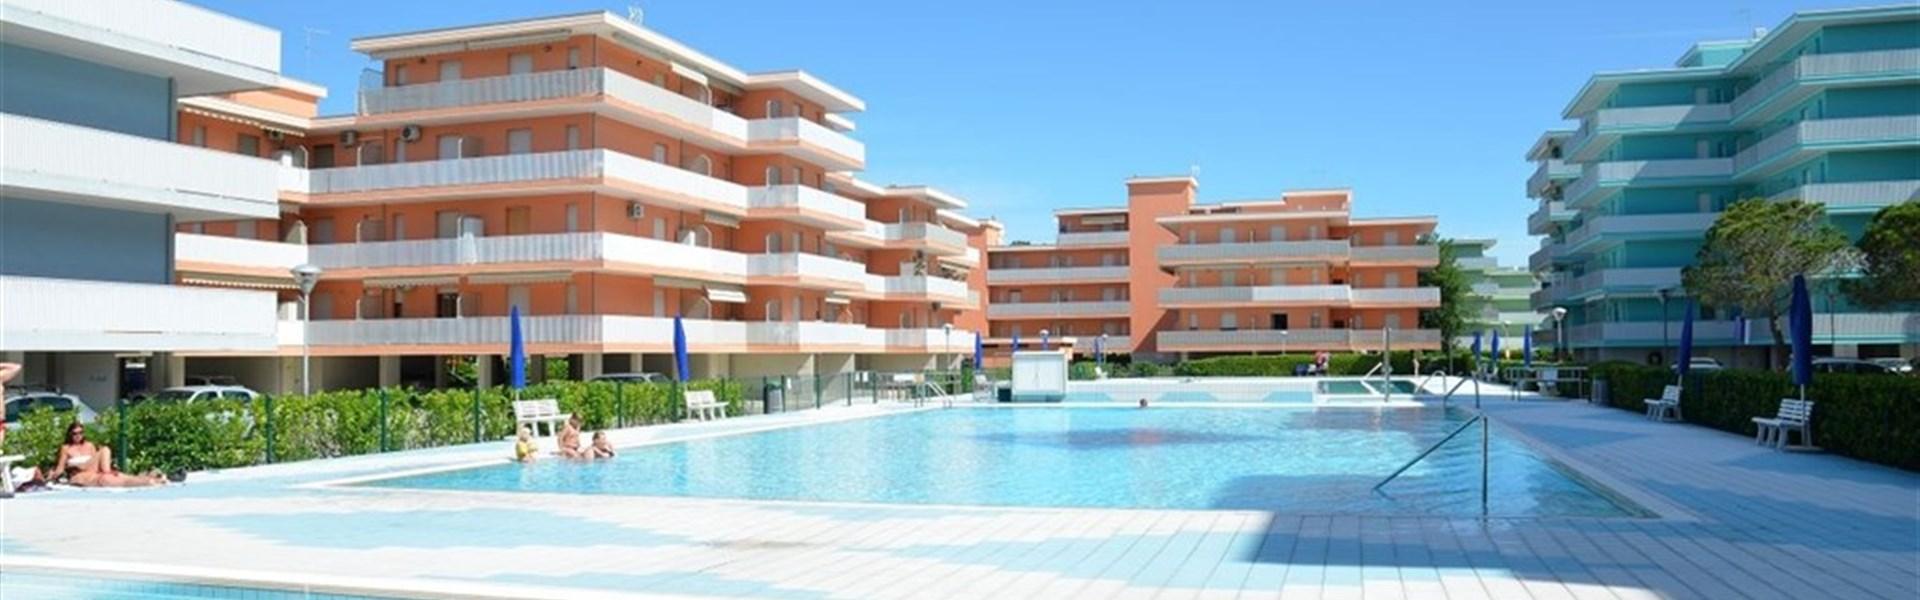 Residence Valbella -